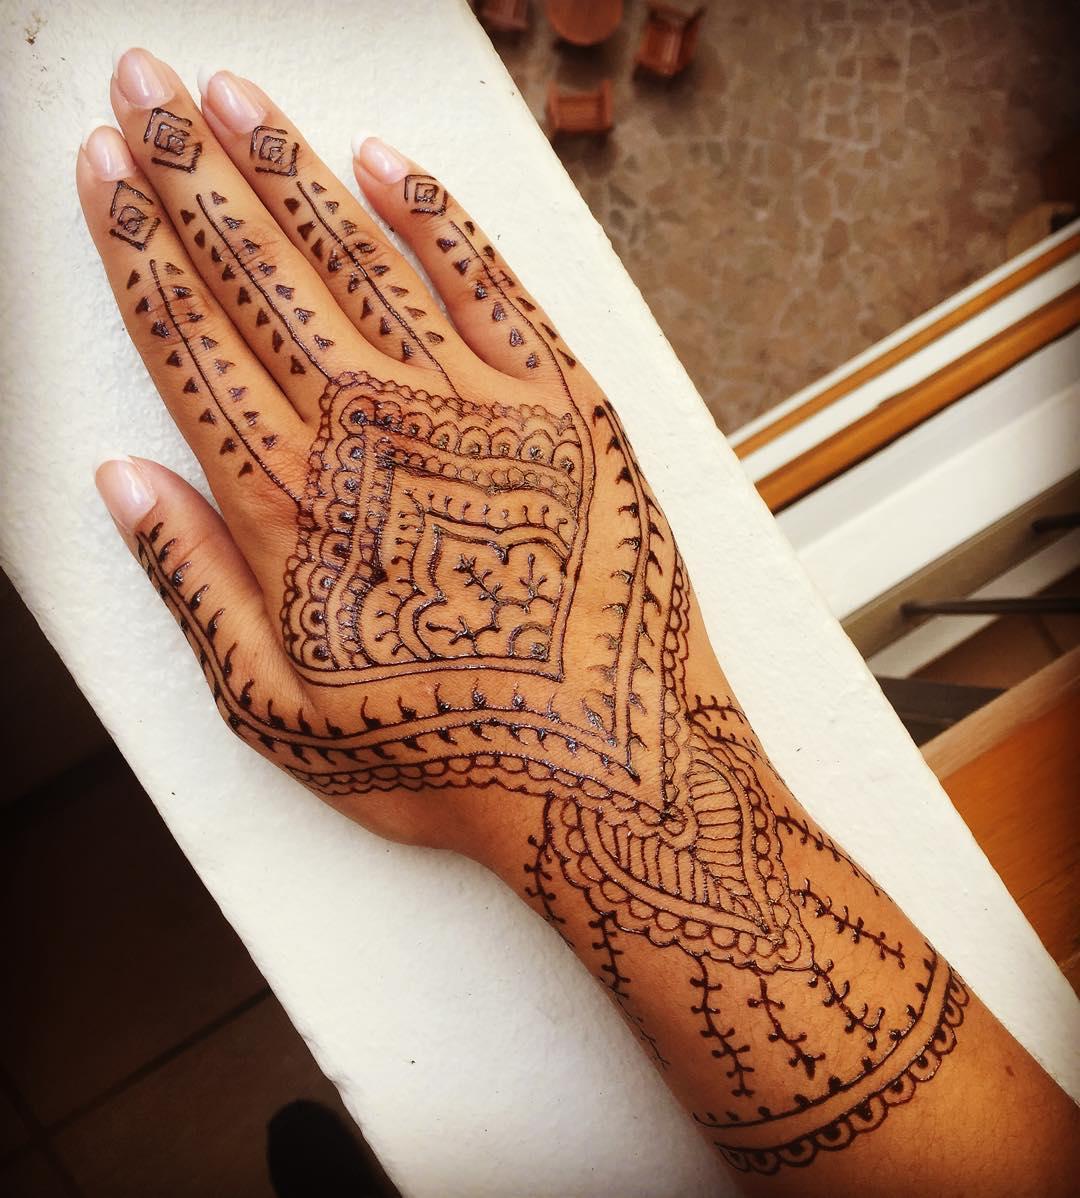 Henna Tattoo Drawings: How Long Do Henna Tattoos Last